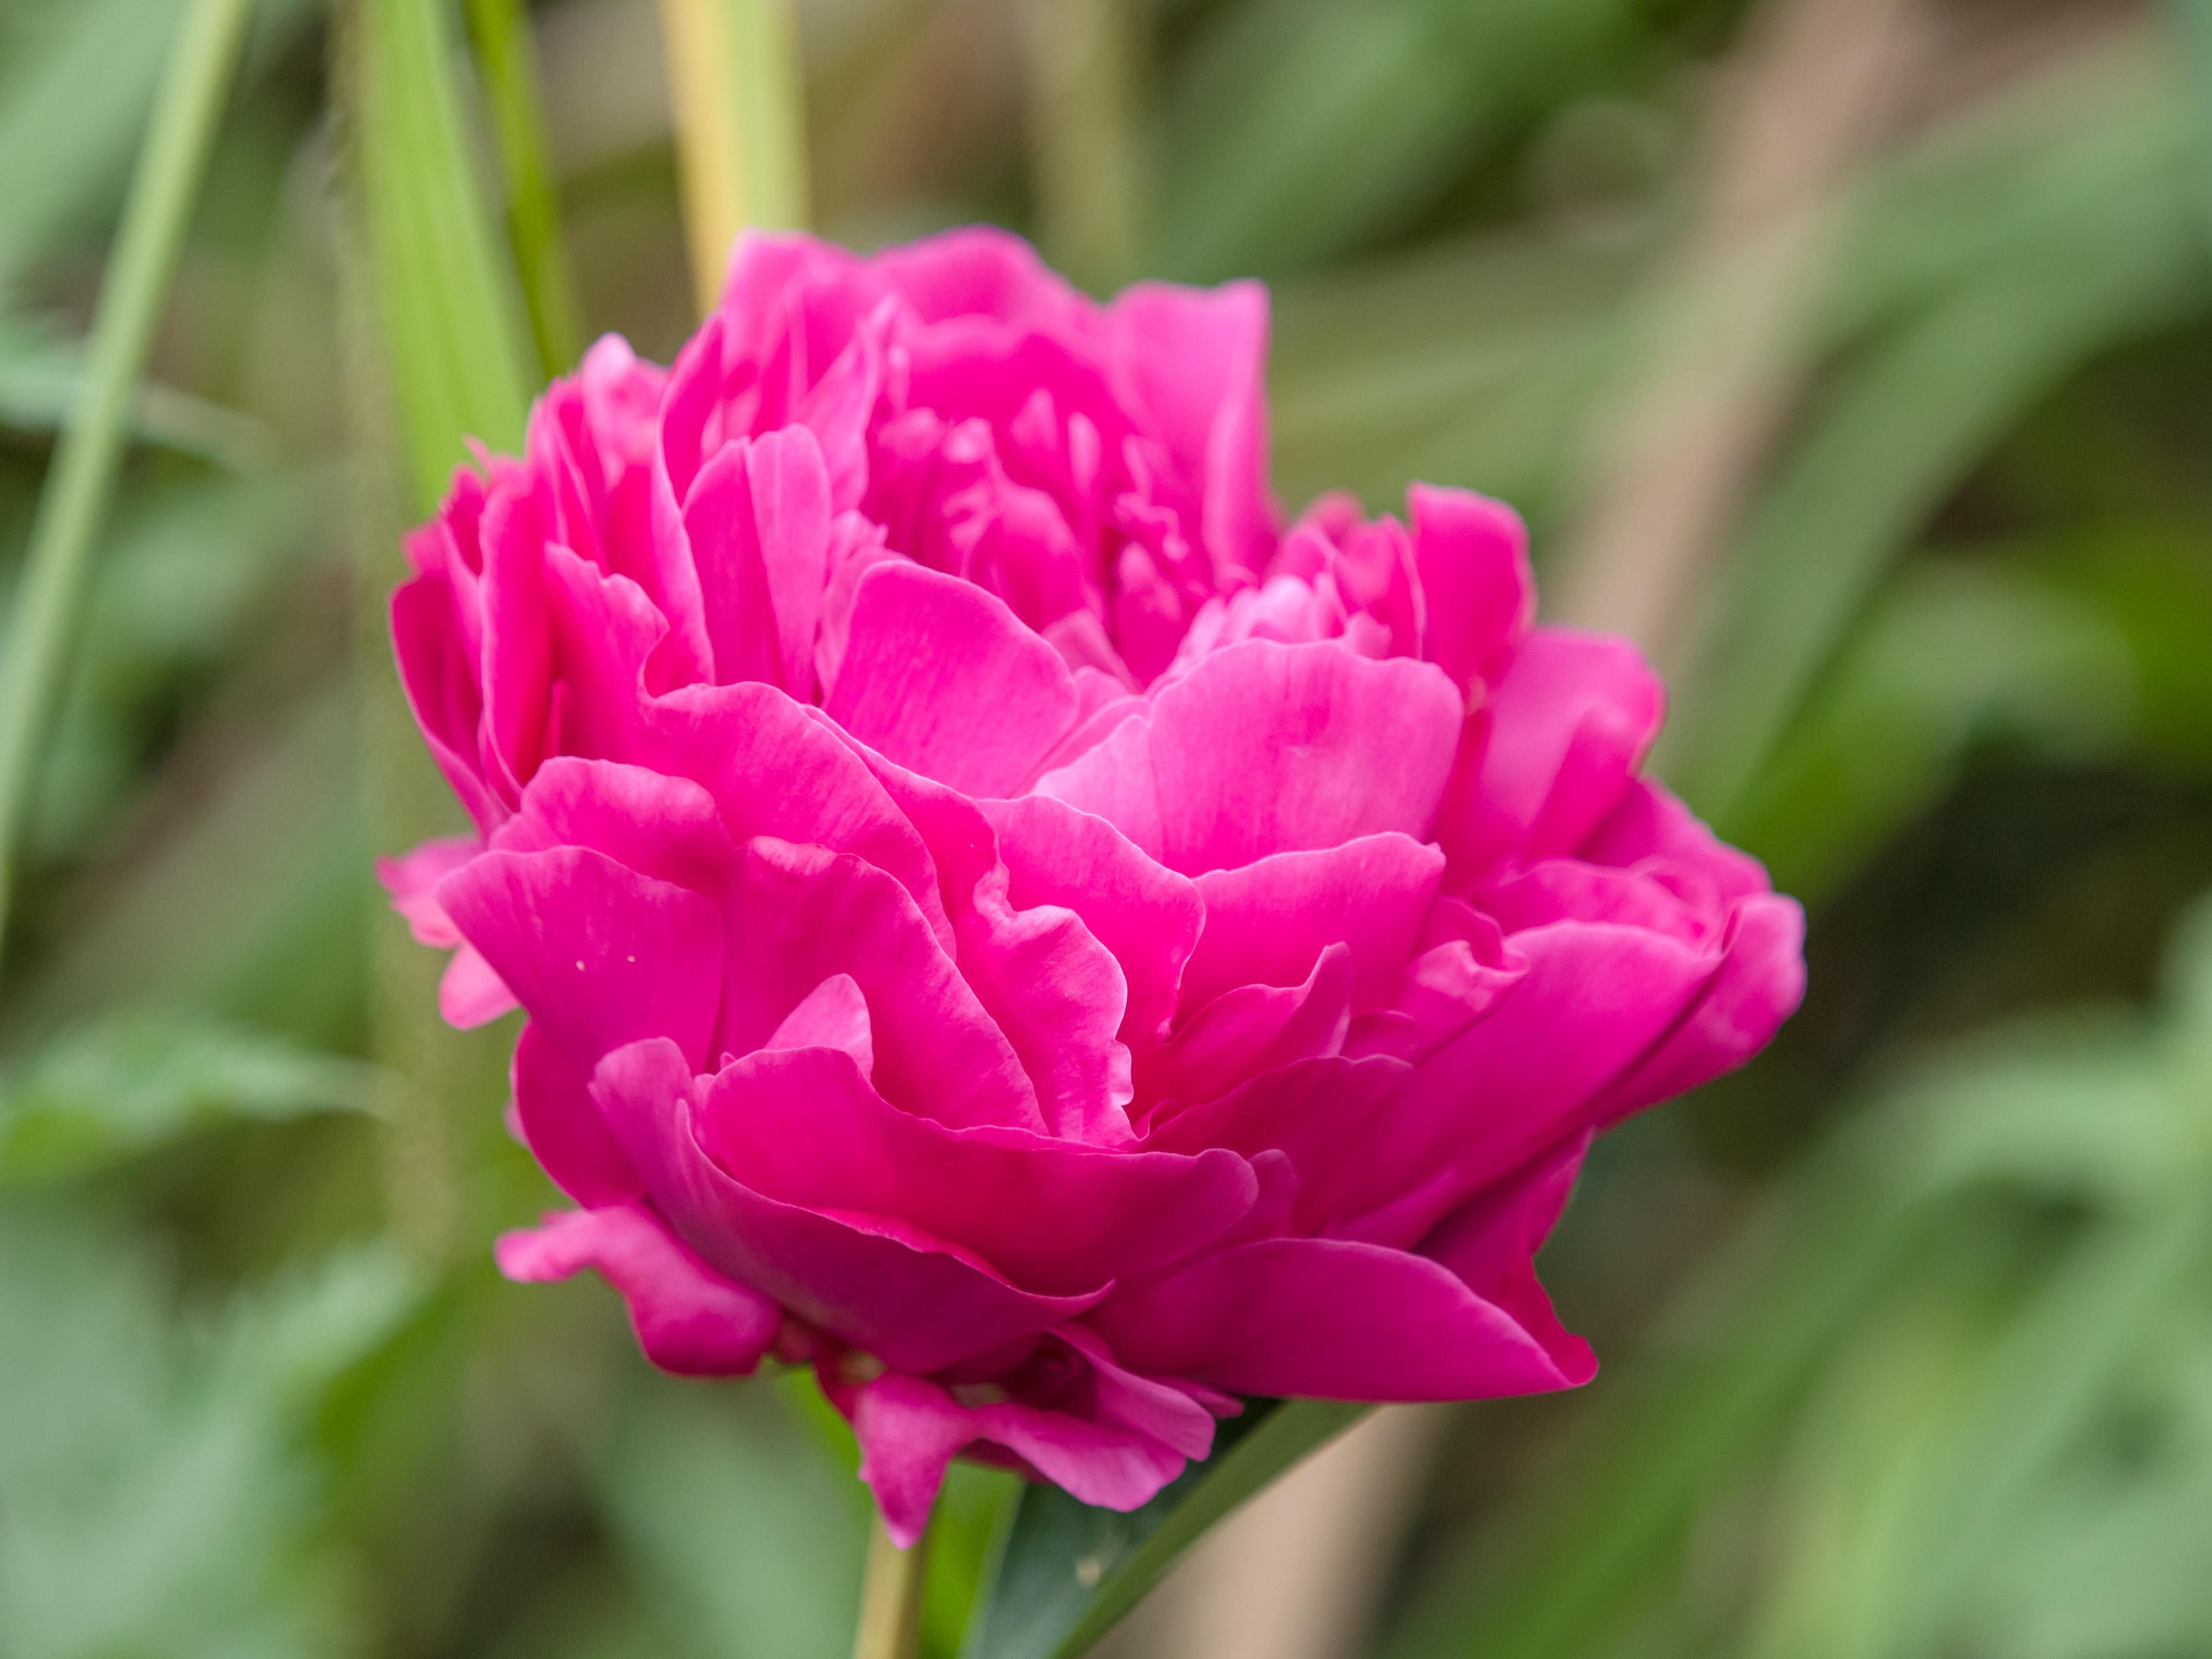 Filebright pink flower 14253297107g wikimedia commons filebright pink flower 14253297107g mightylinksfo Choice Image